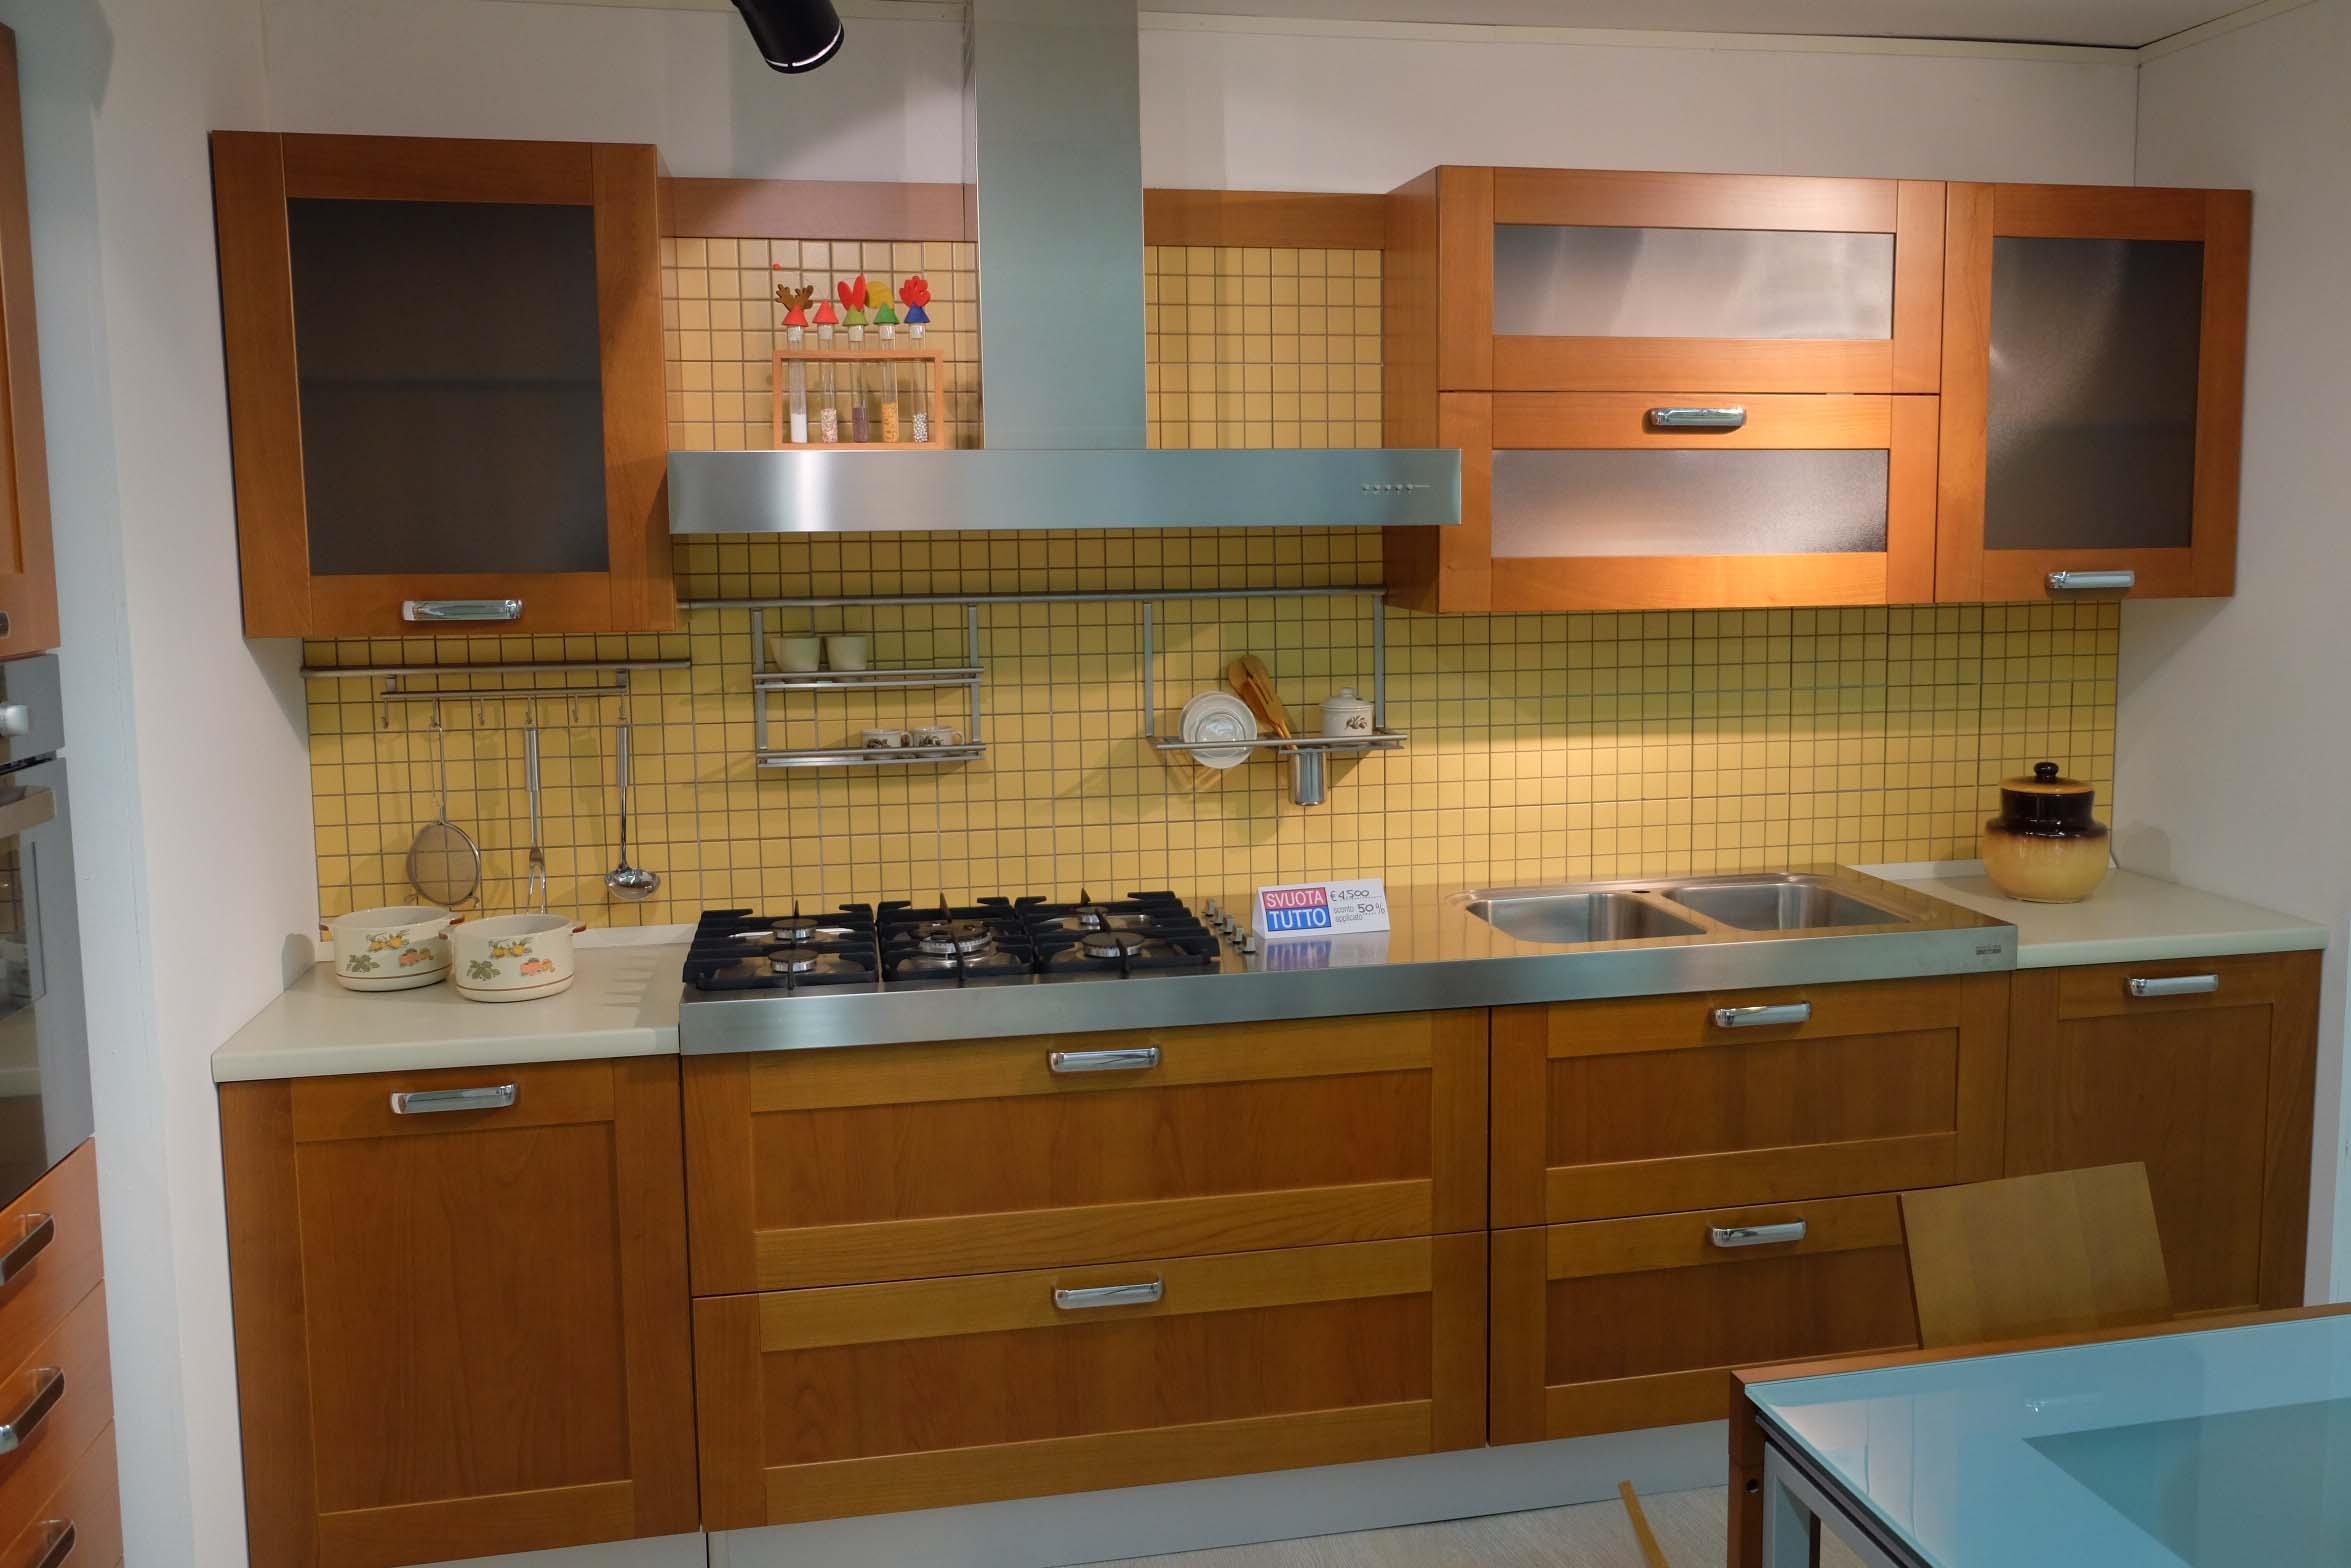 Cucina gentili cucine quadria scontato del 58 cucine - Cucine in ciliegio moderne ...